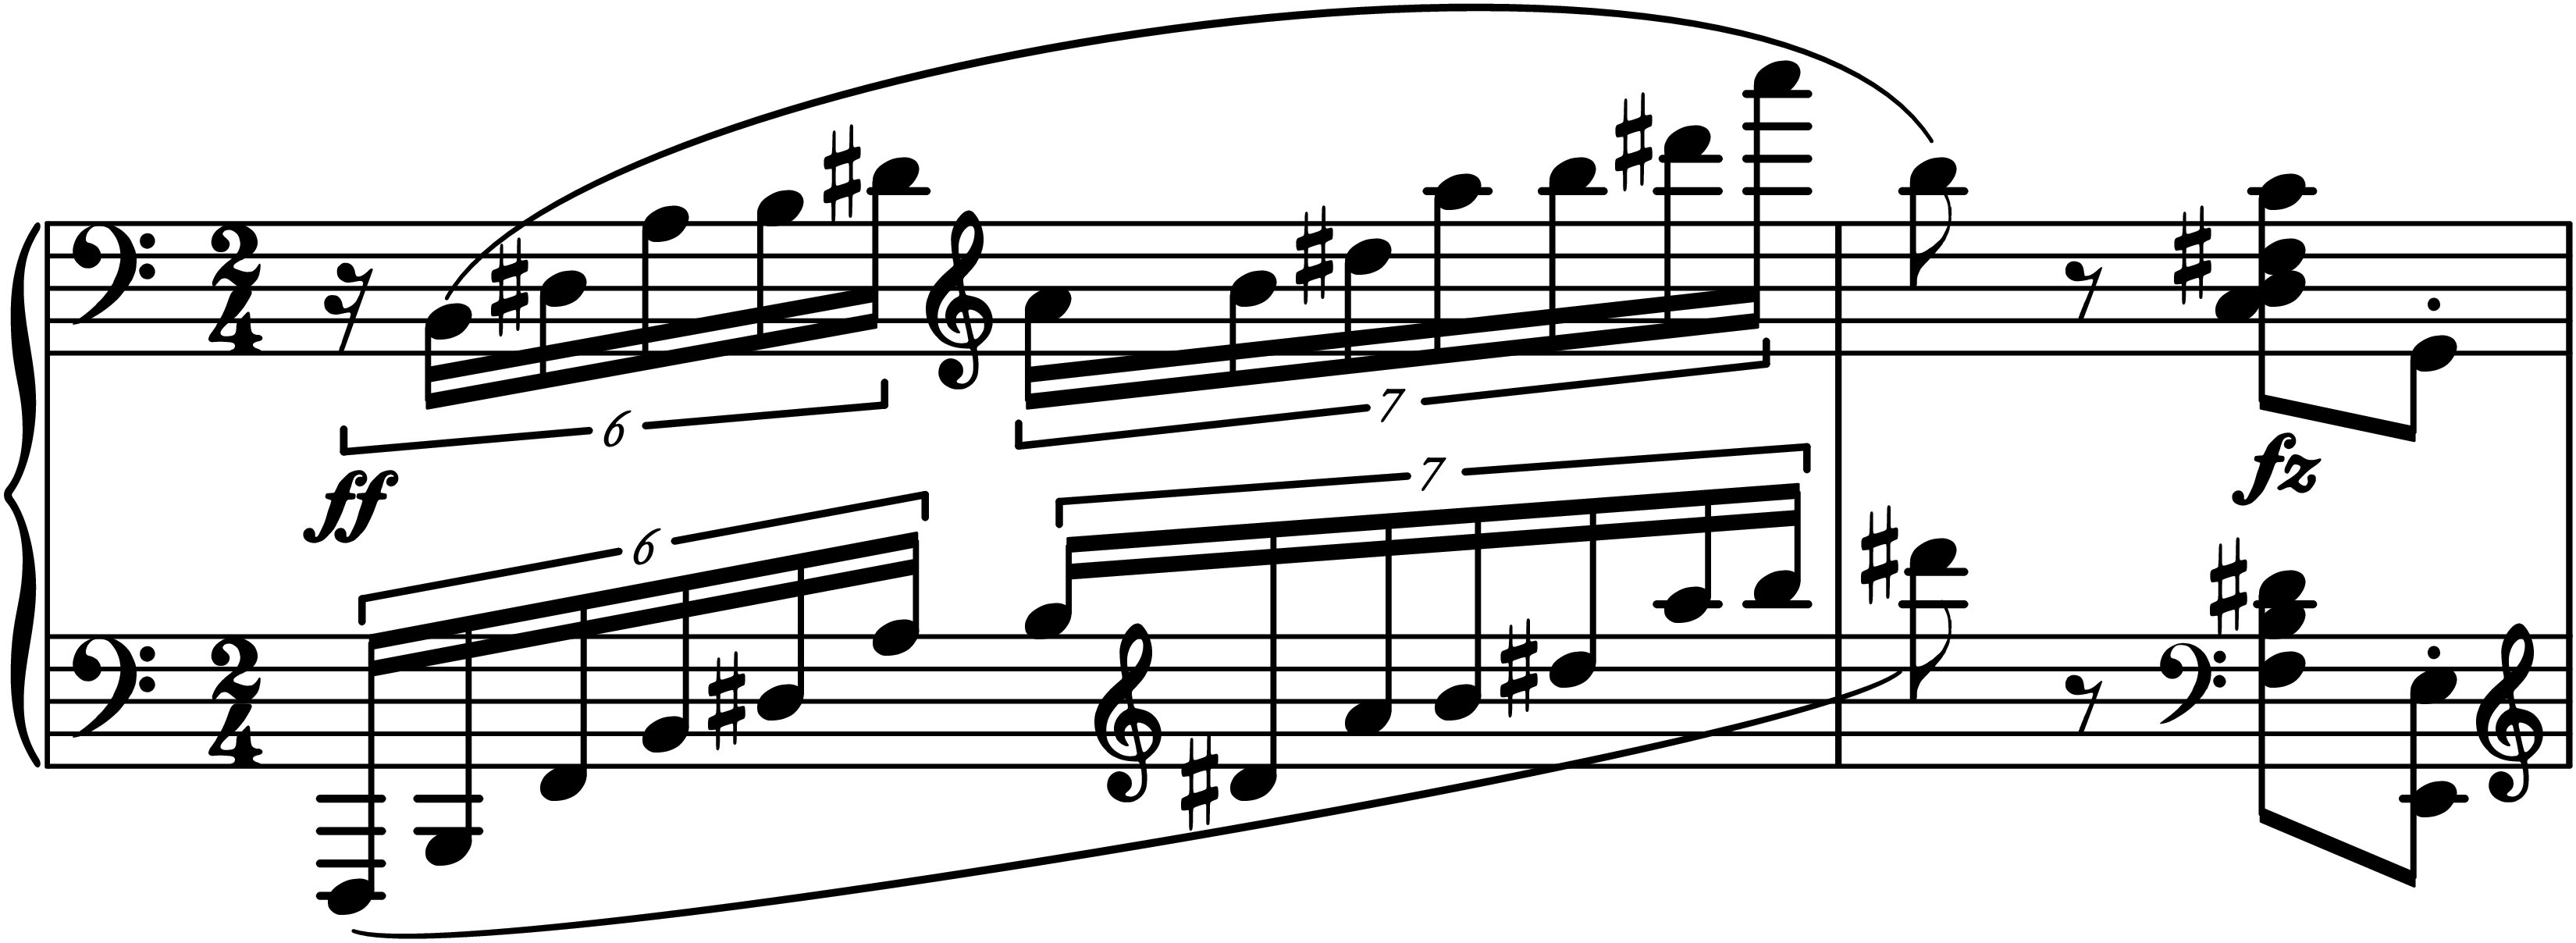 each 13-tuplet is broken down into a 6-tuplet followed by a 7-tuplet